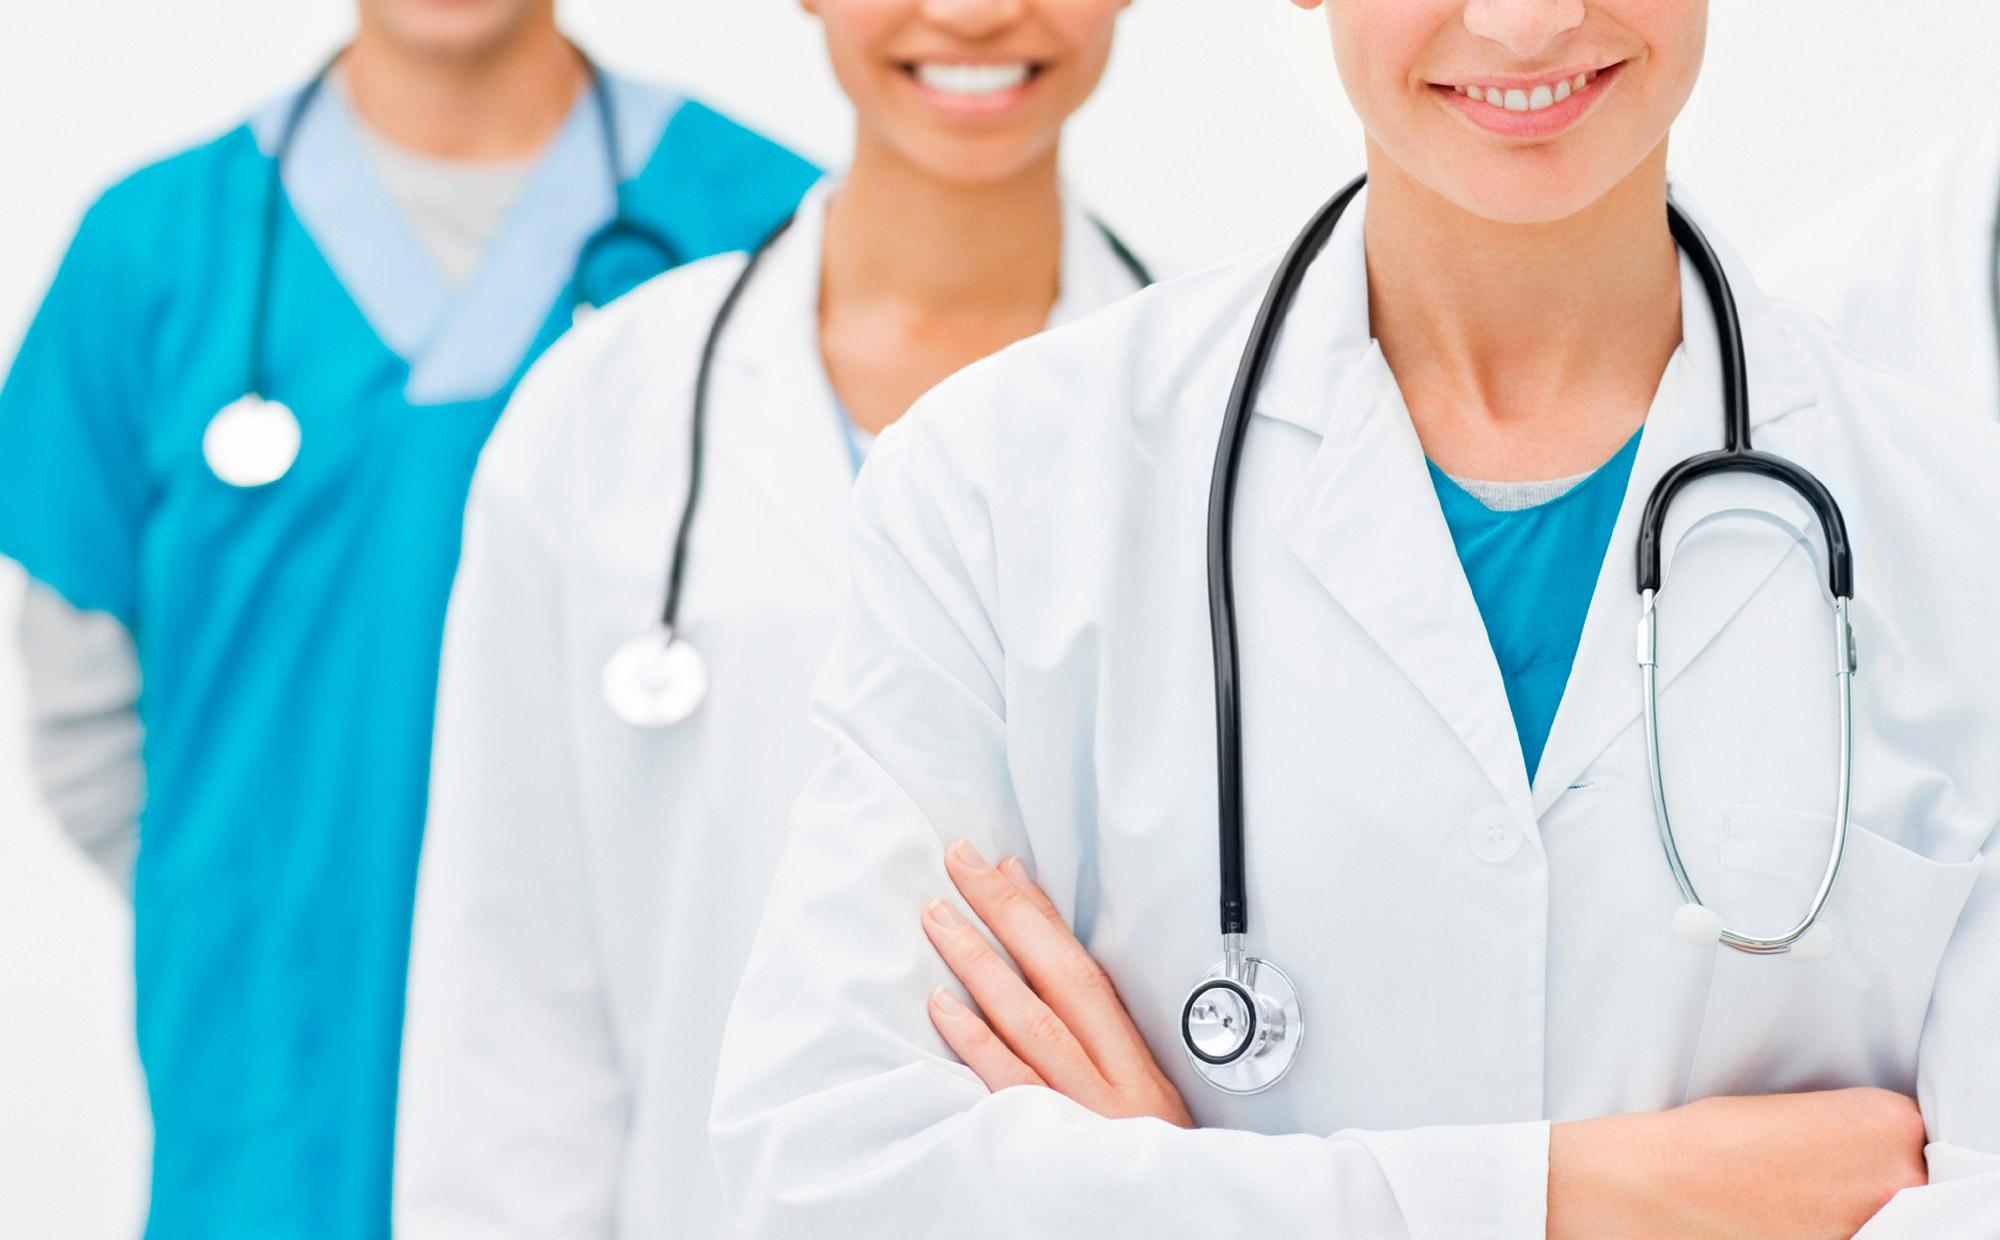 http://brasiltelemedicina.com.br/wp-content/uploads/2016/07/heart-health.jpg